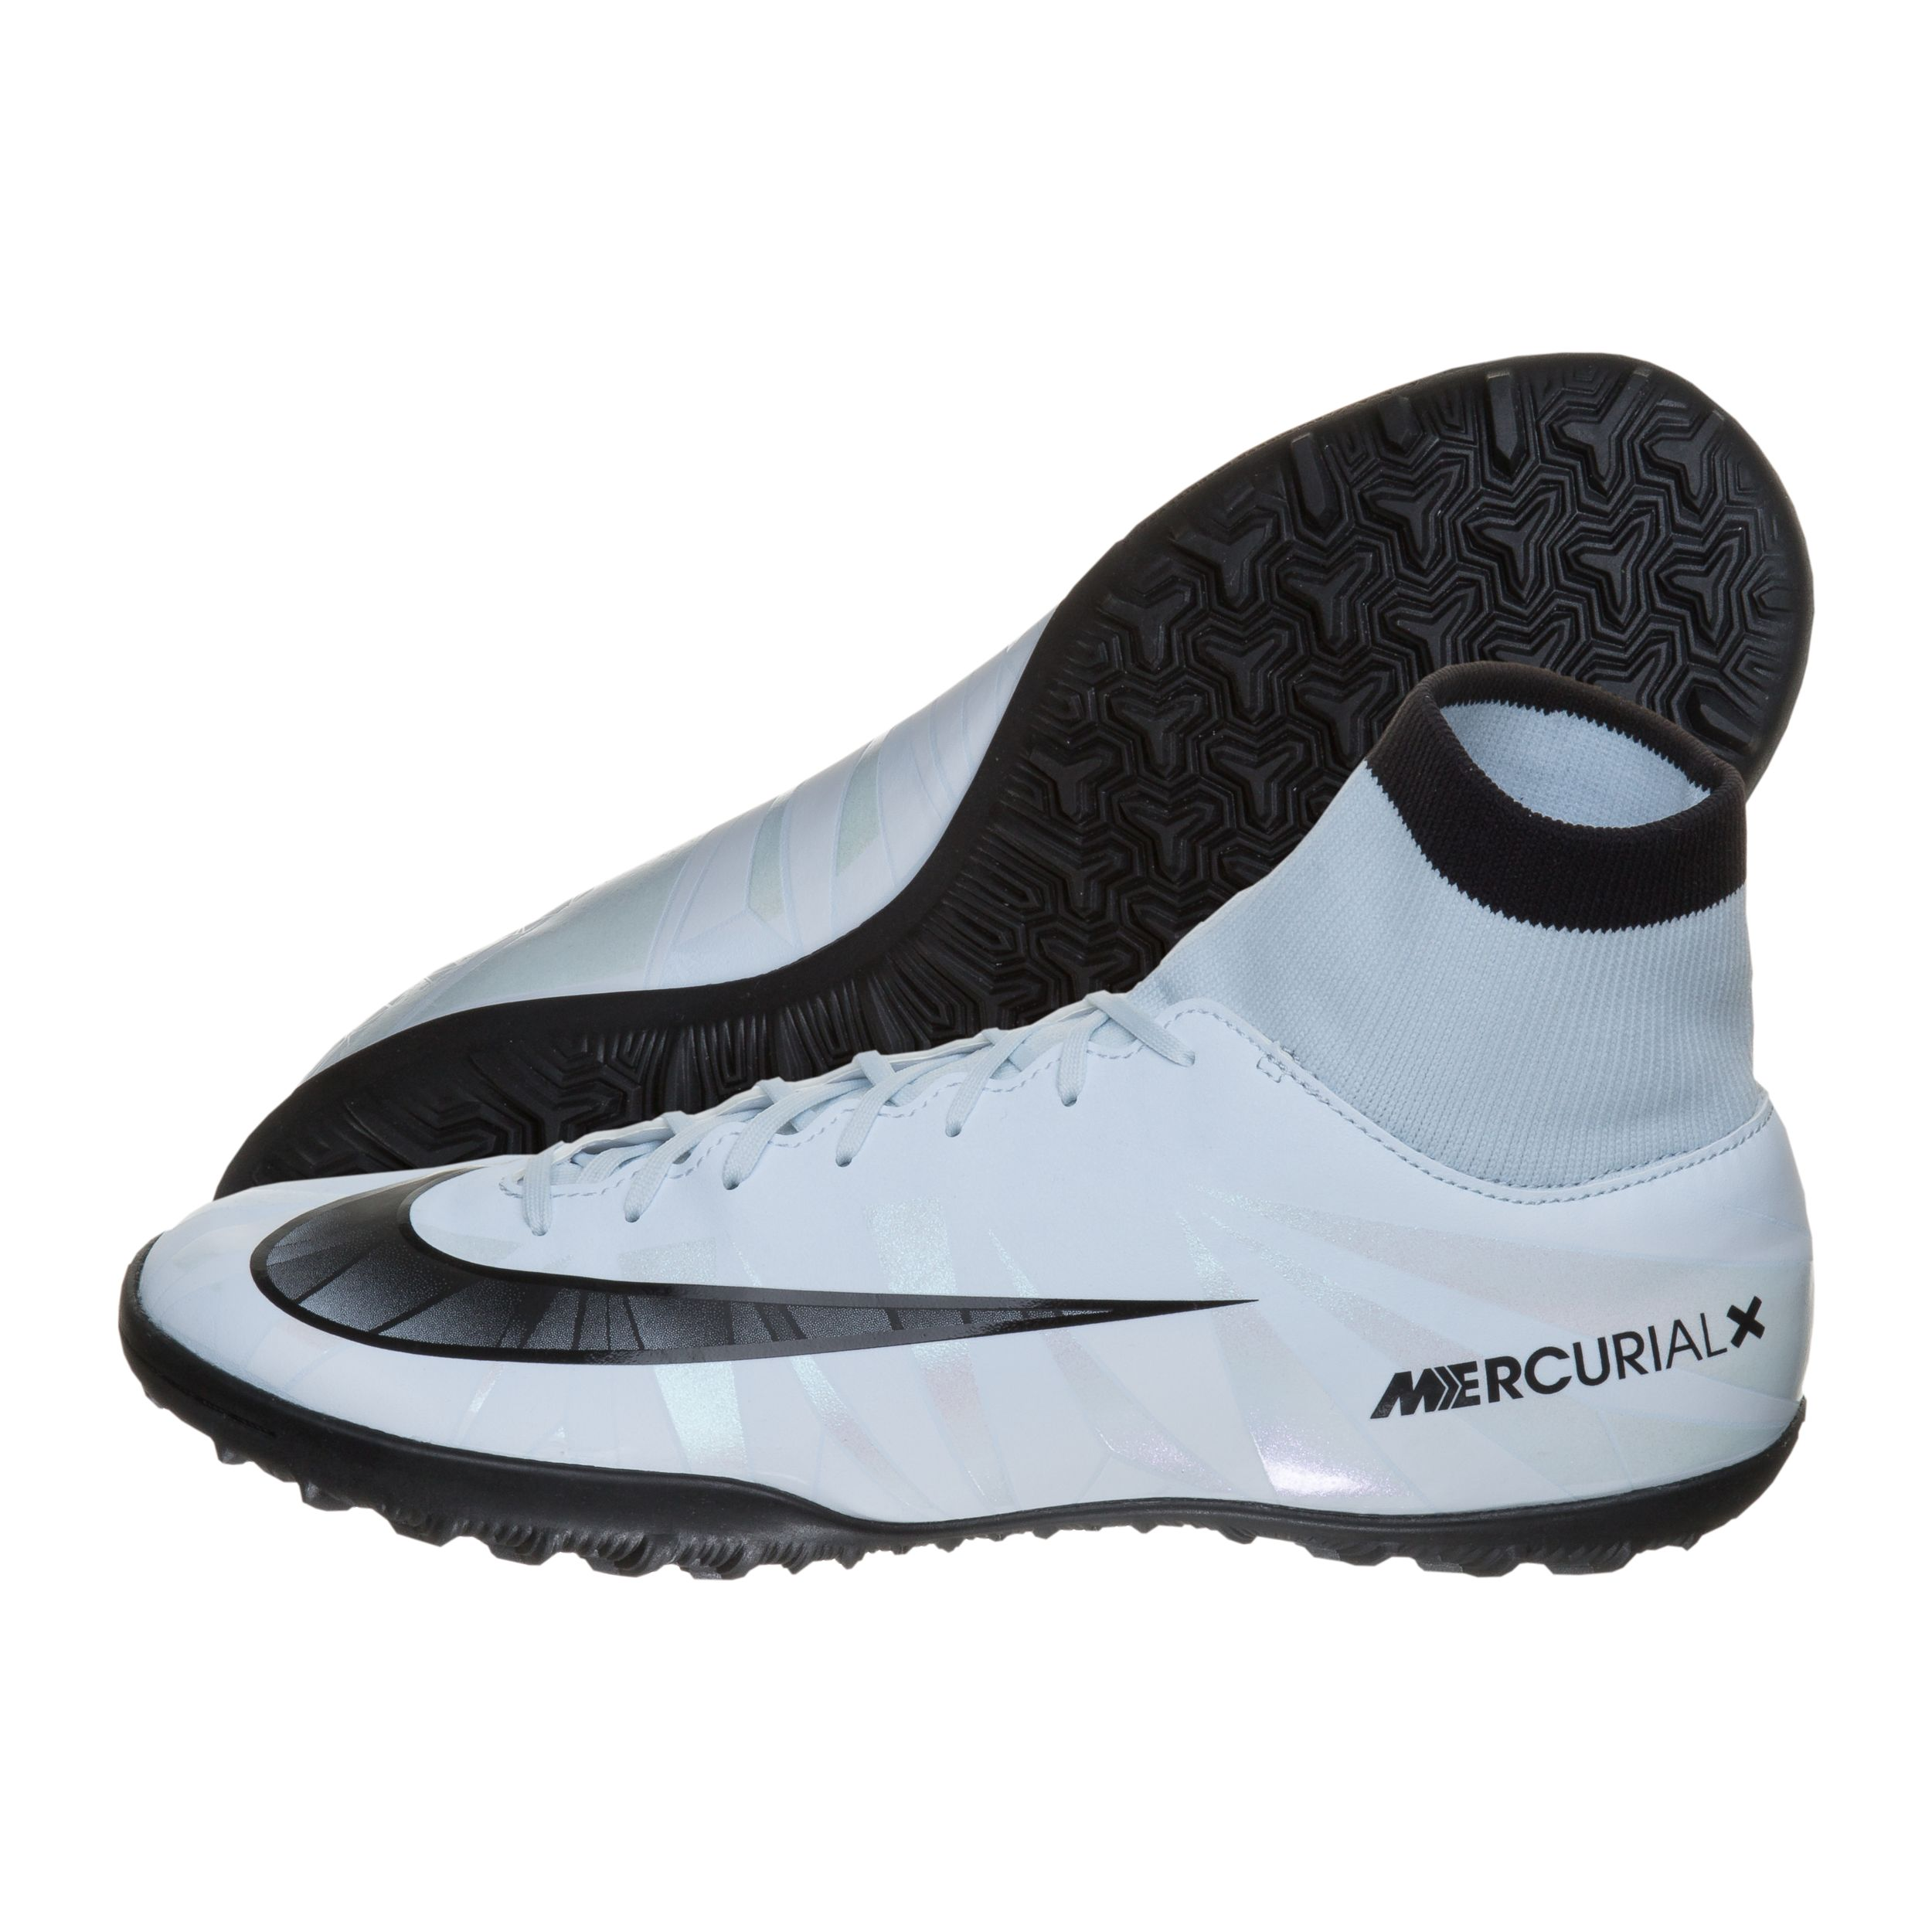 d36be69d2aec Teamsport Philipp   Nike MercurialX Victory VI CR7 DF TF 46 903612 ...